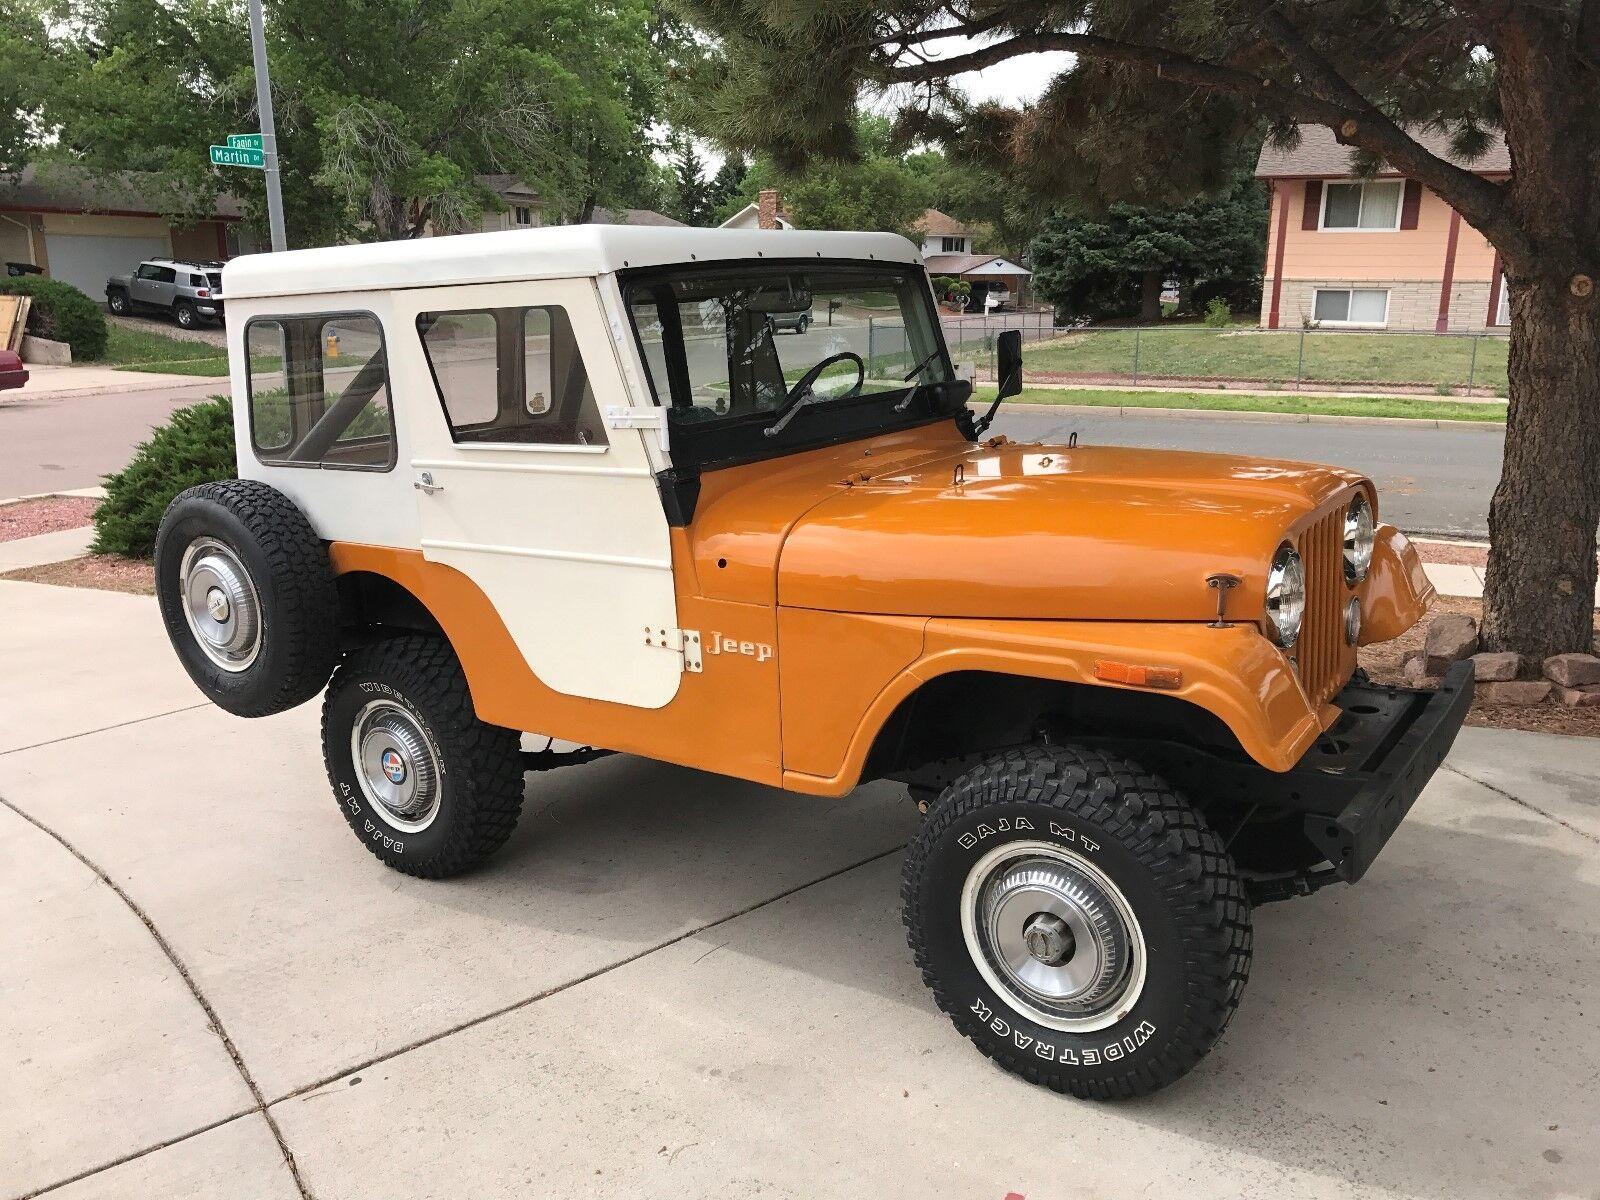 1973 Jeep Cj5 1 Owner Very Cool Low Original Mile Survivor